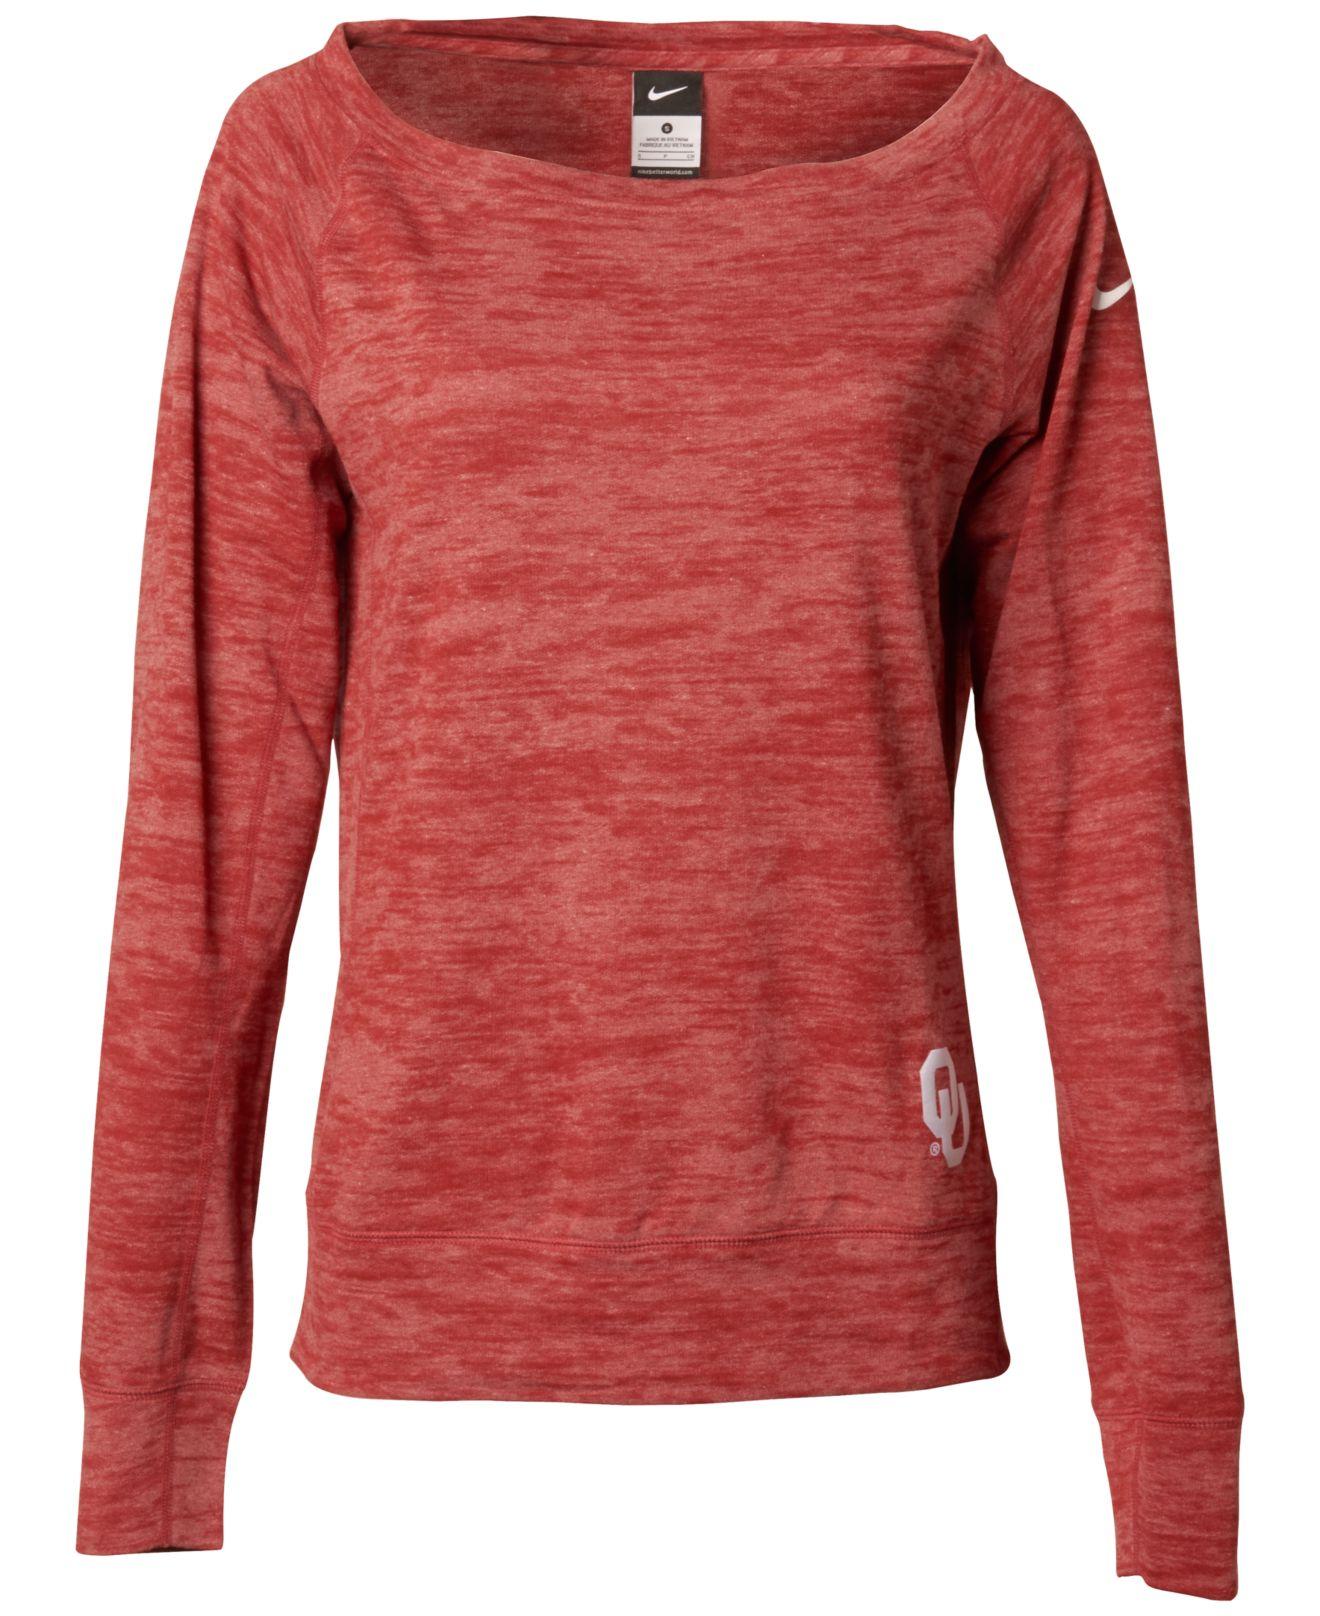 warm long sleeve t shirts artee shirt